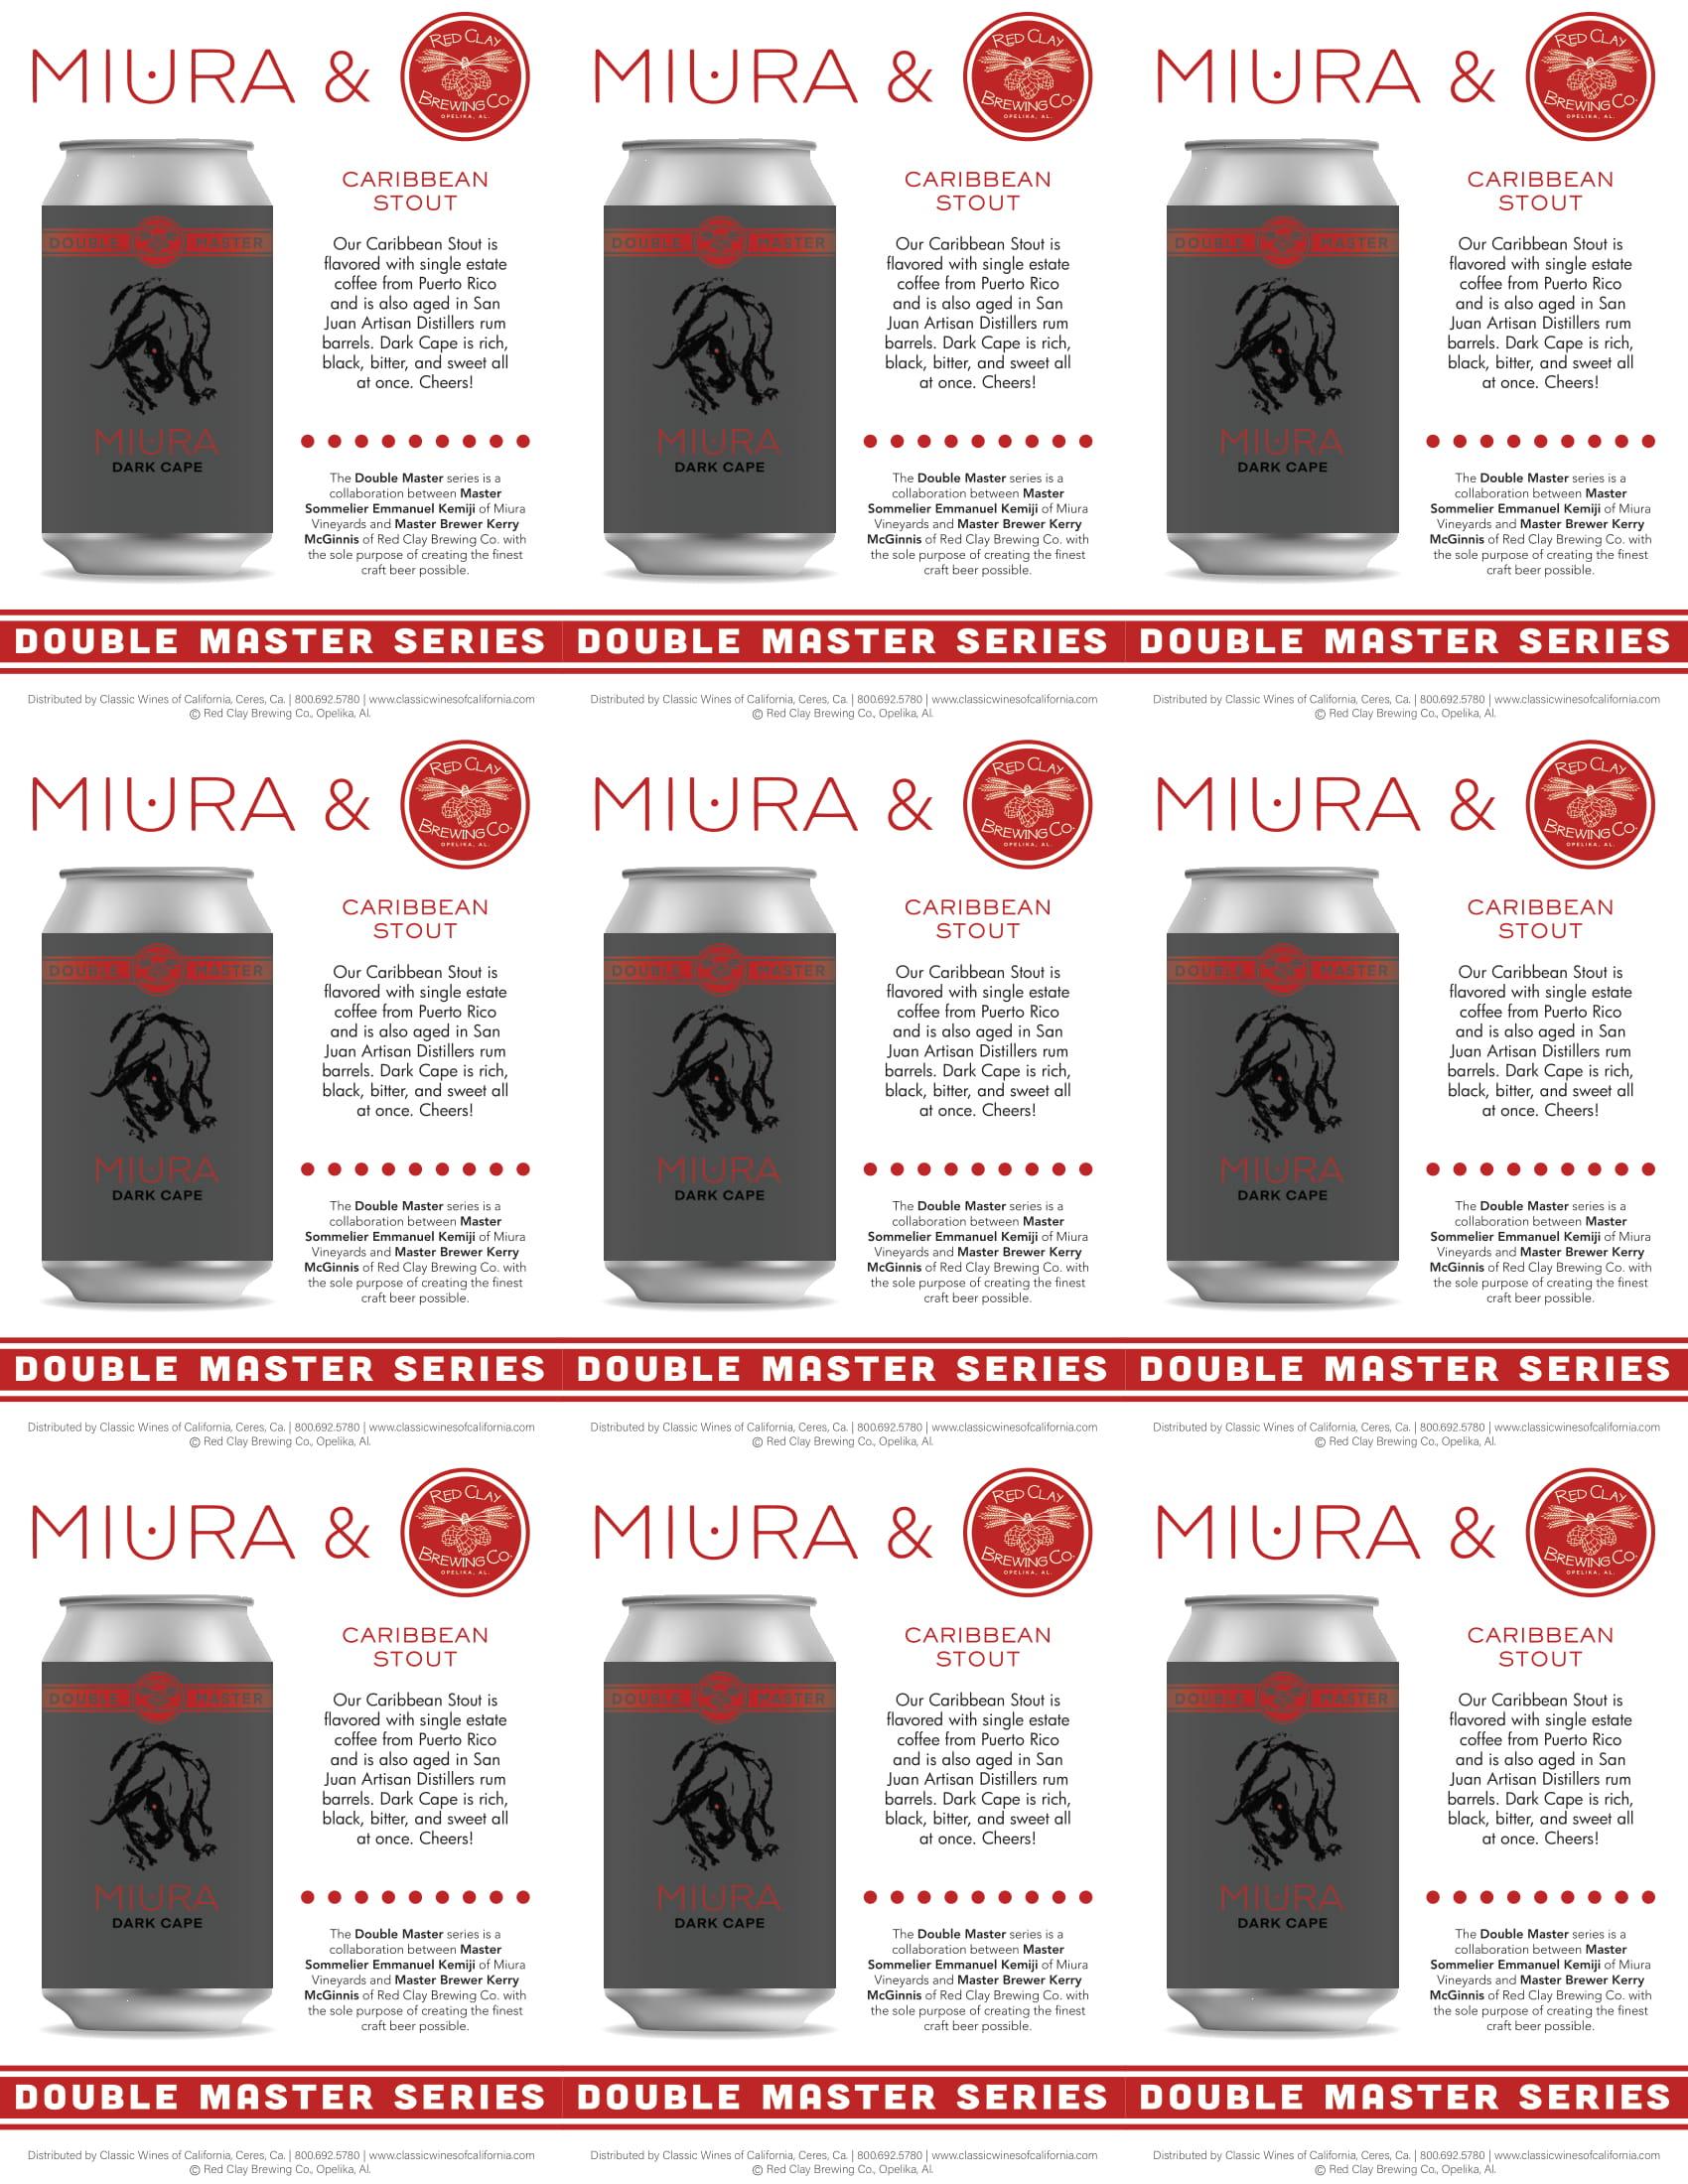 Miura Craft Beer Caribbean Stout Shelf Talker